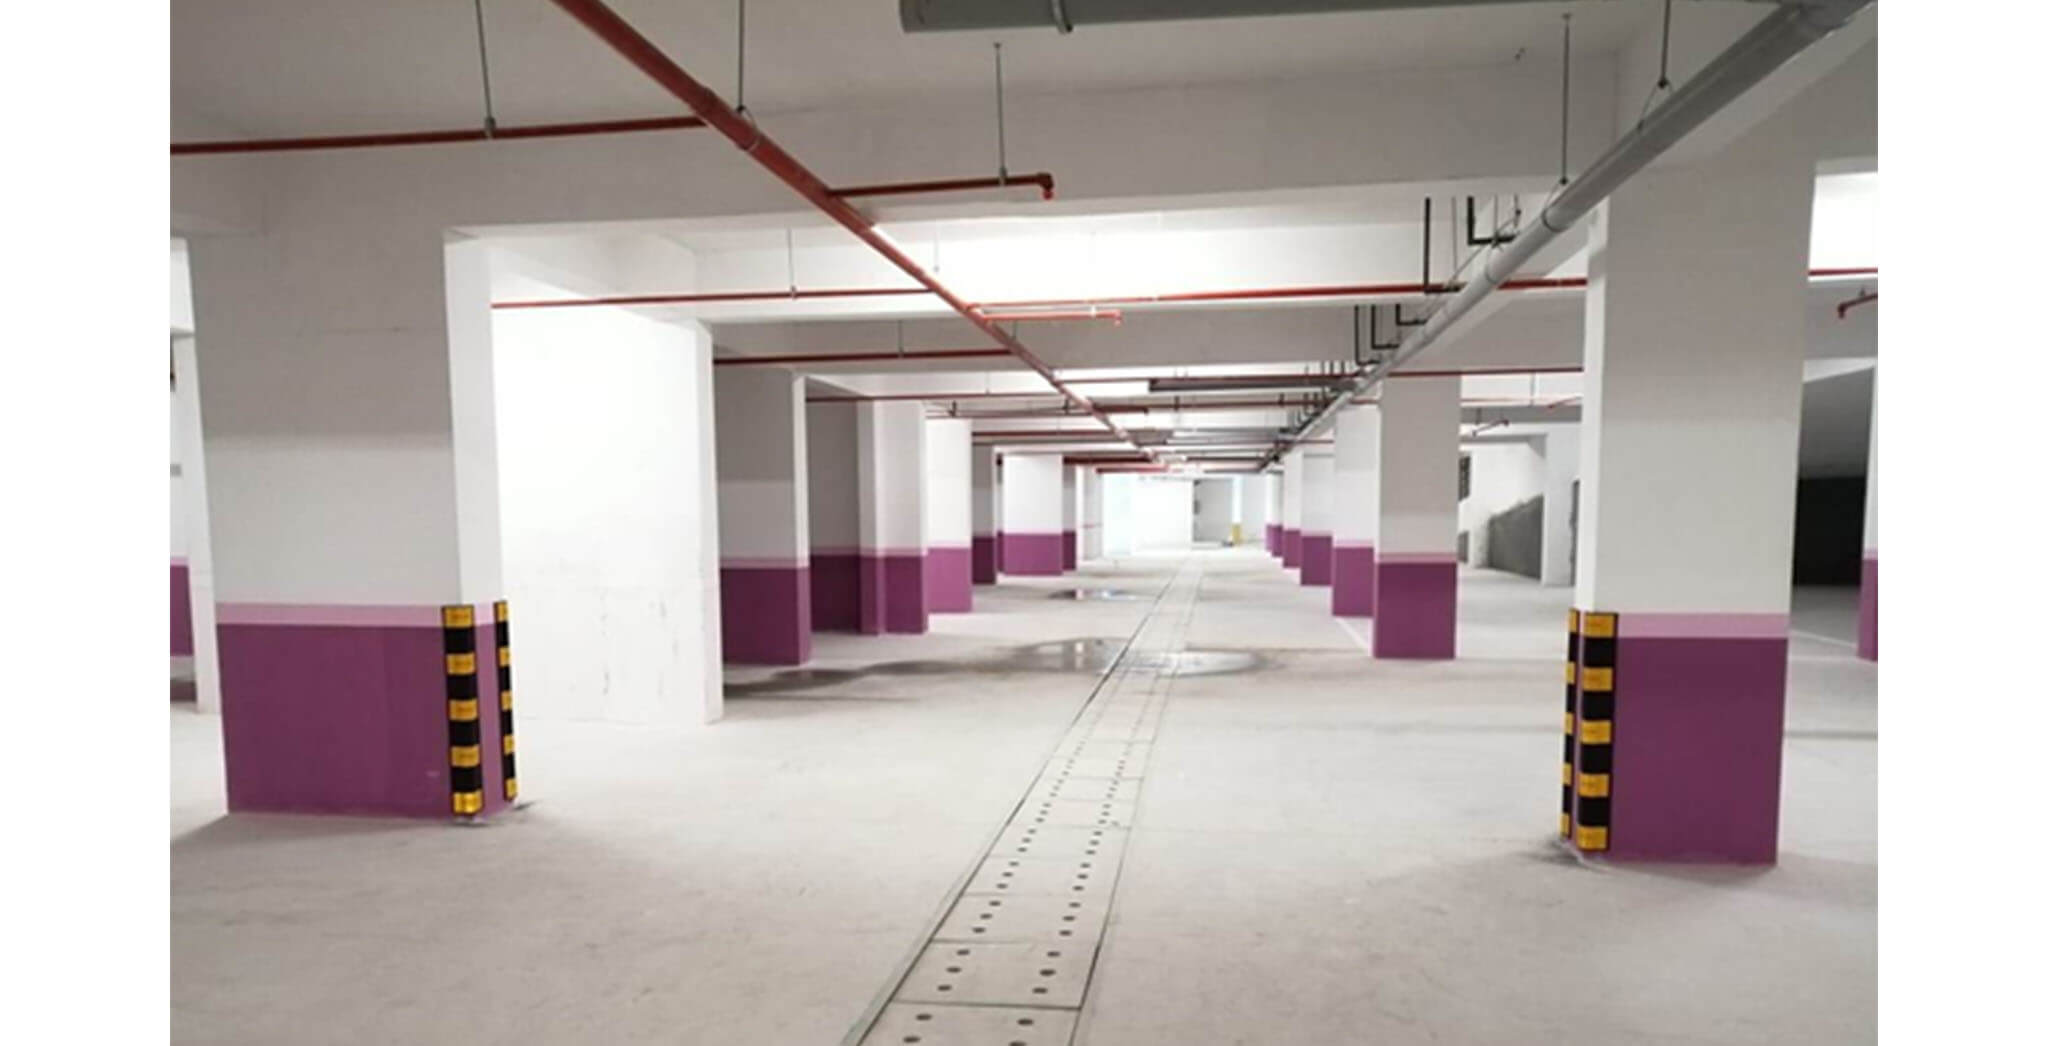 Oct 2019 - Basement finishing work-in-progress